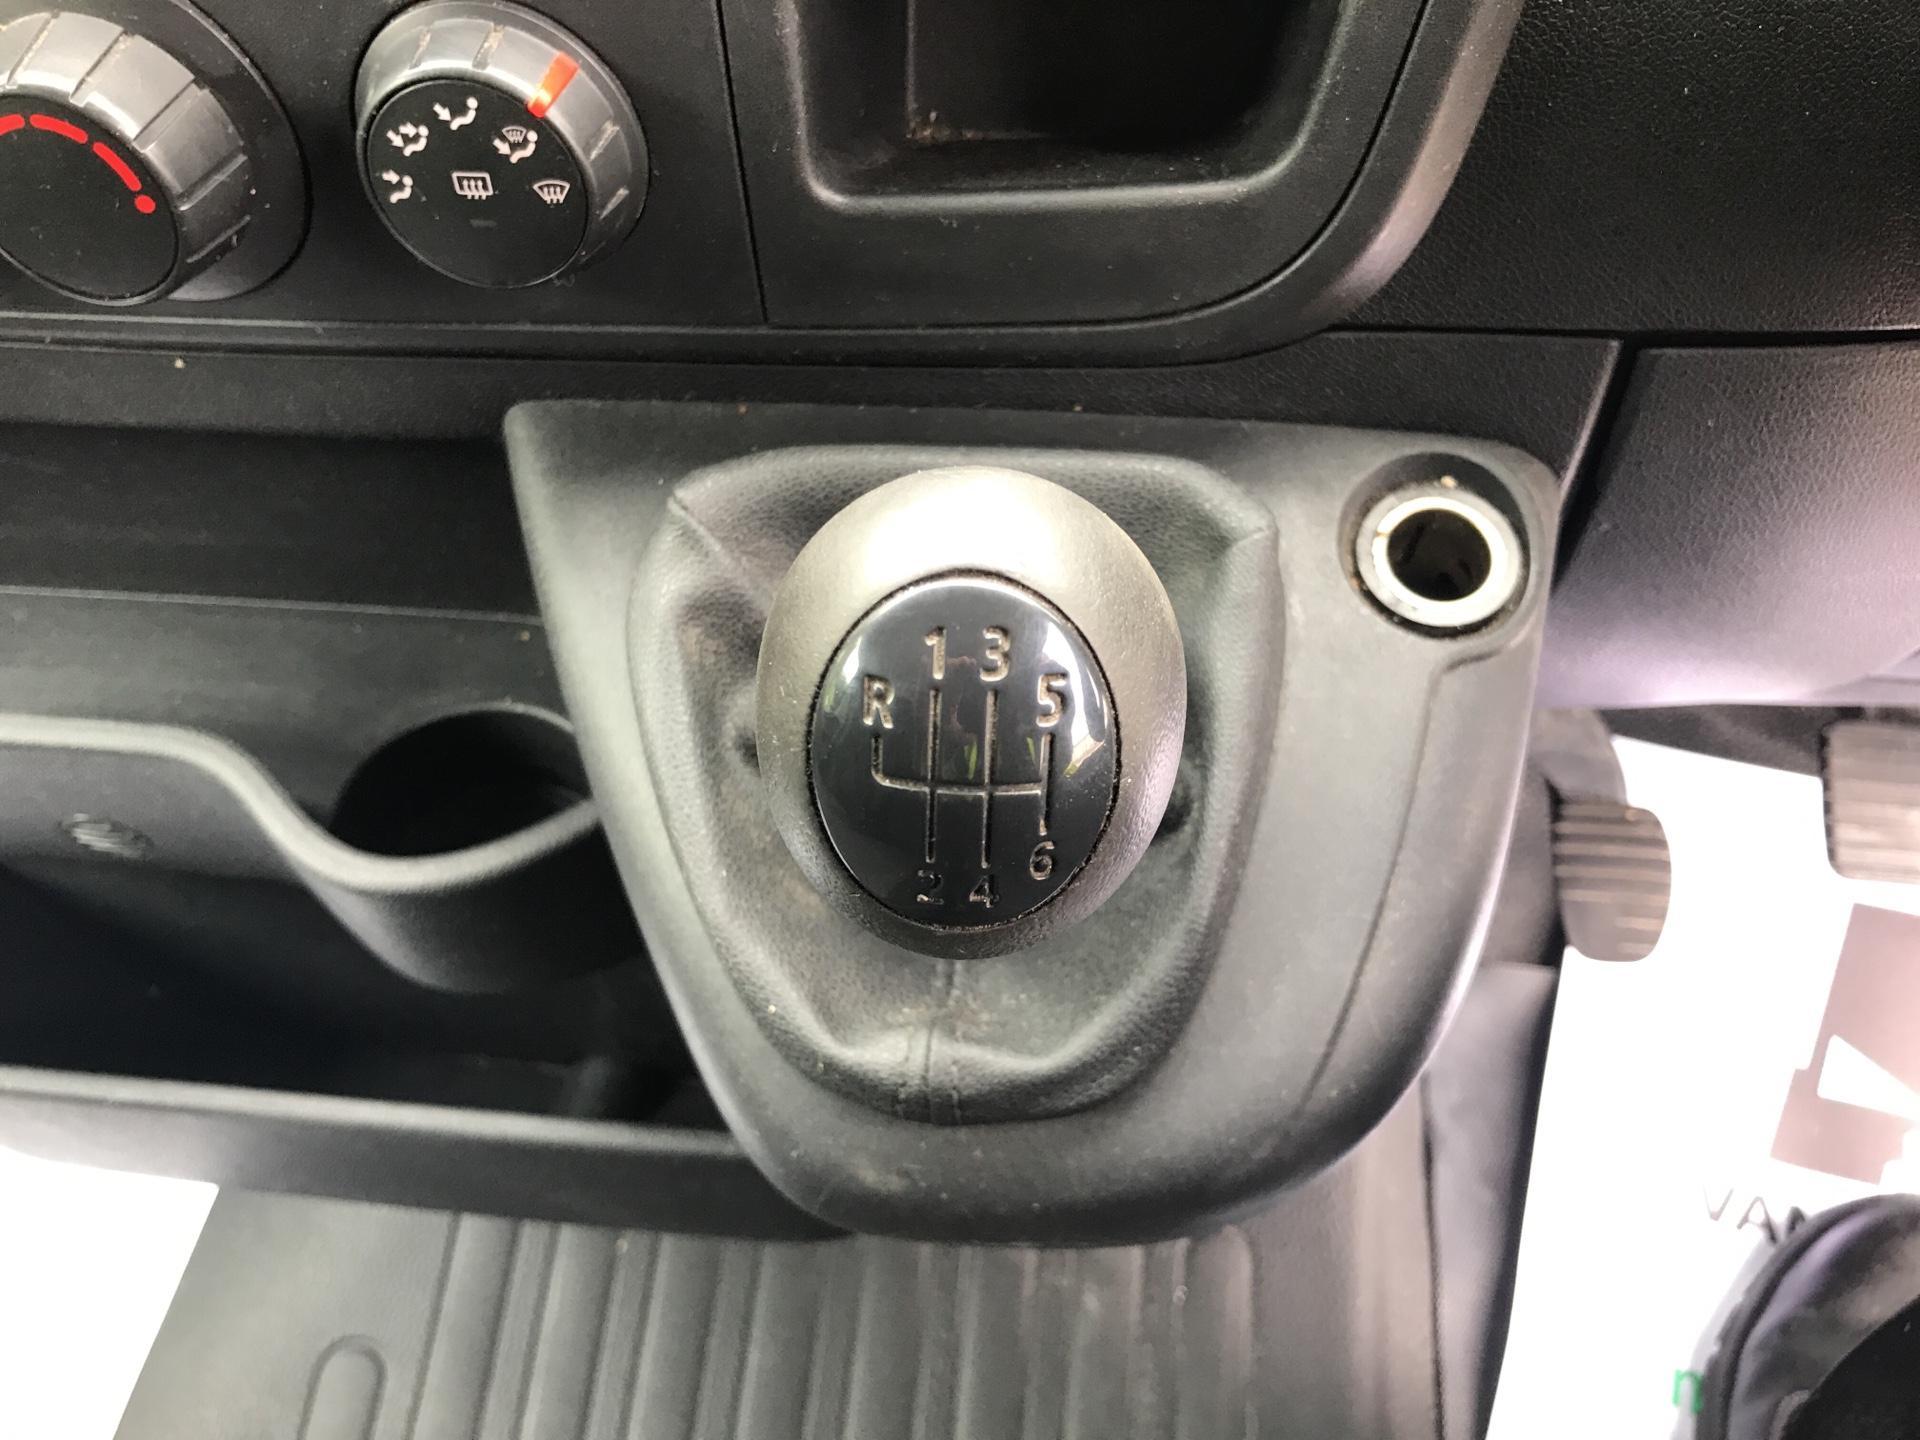 2016 Vauxhall Movano 2.3 CDTI BITURBO ECOFLEX H1 LUTON 136PS (DP65ZZB) Image 11